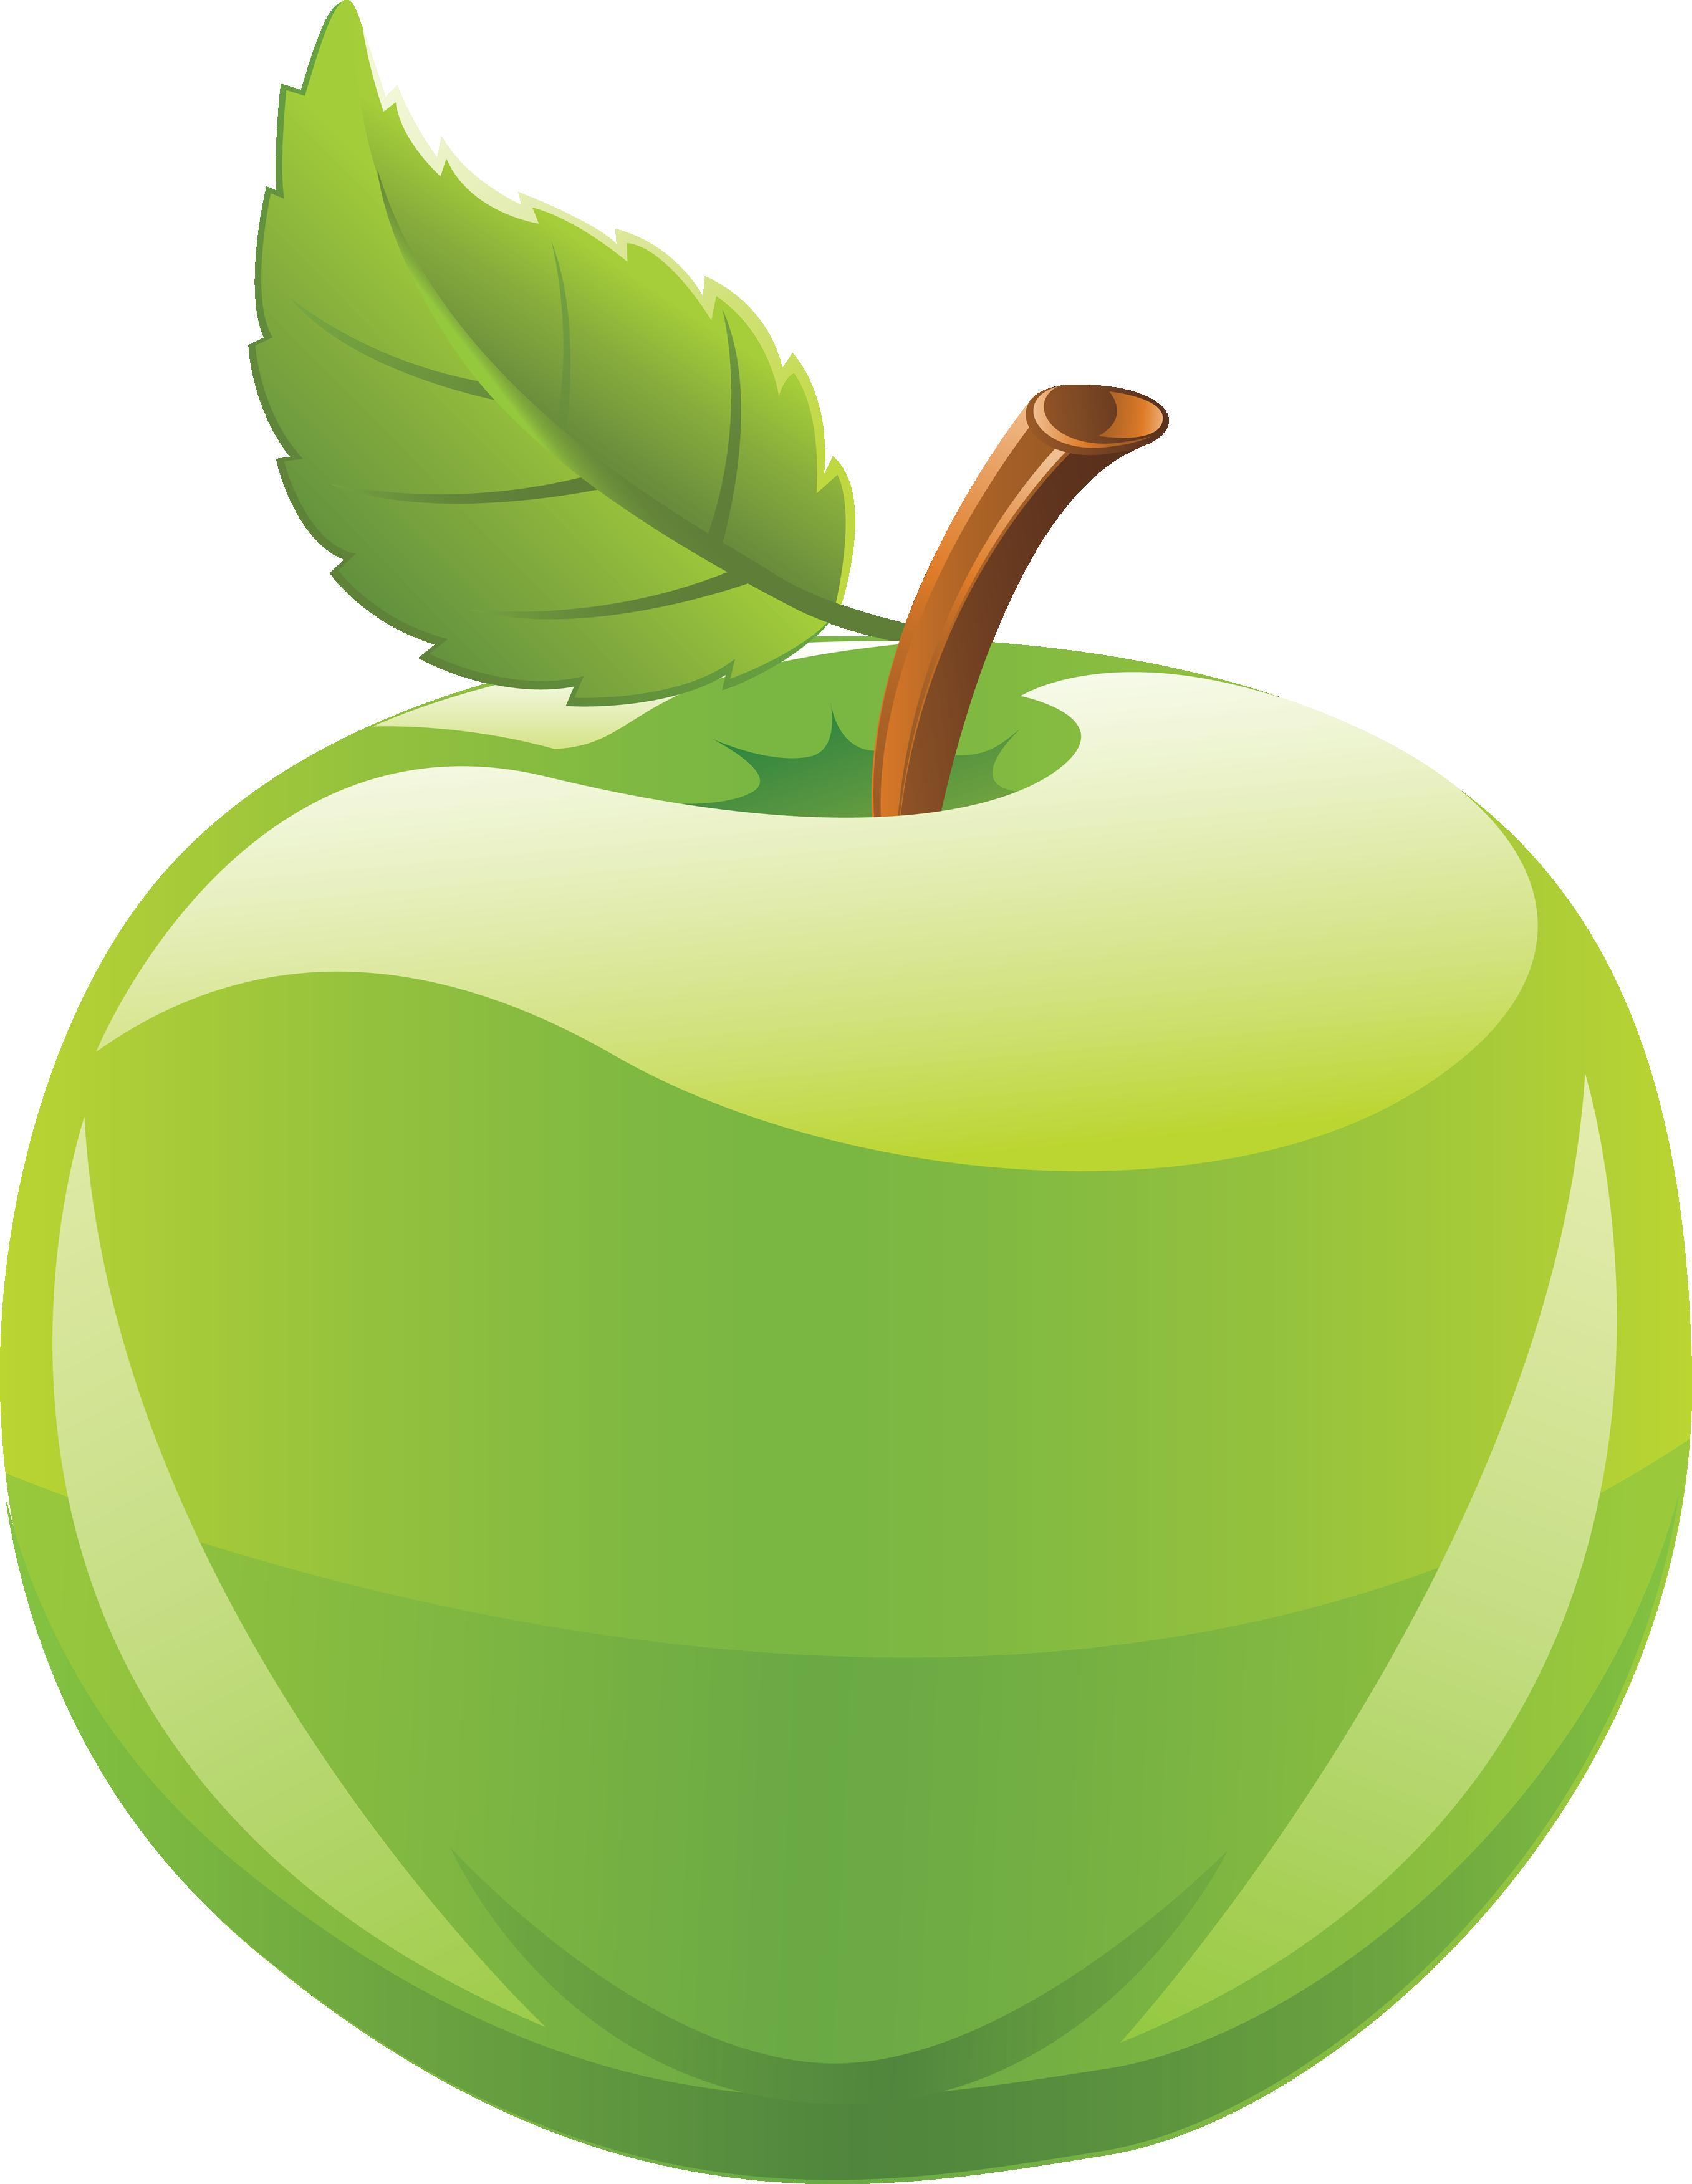 Green Apple Png Image-Green Apple Png Image-14